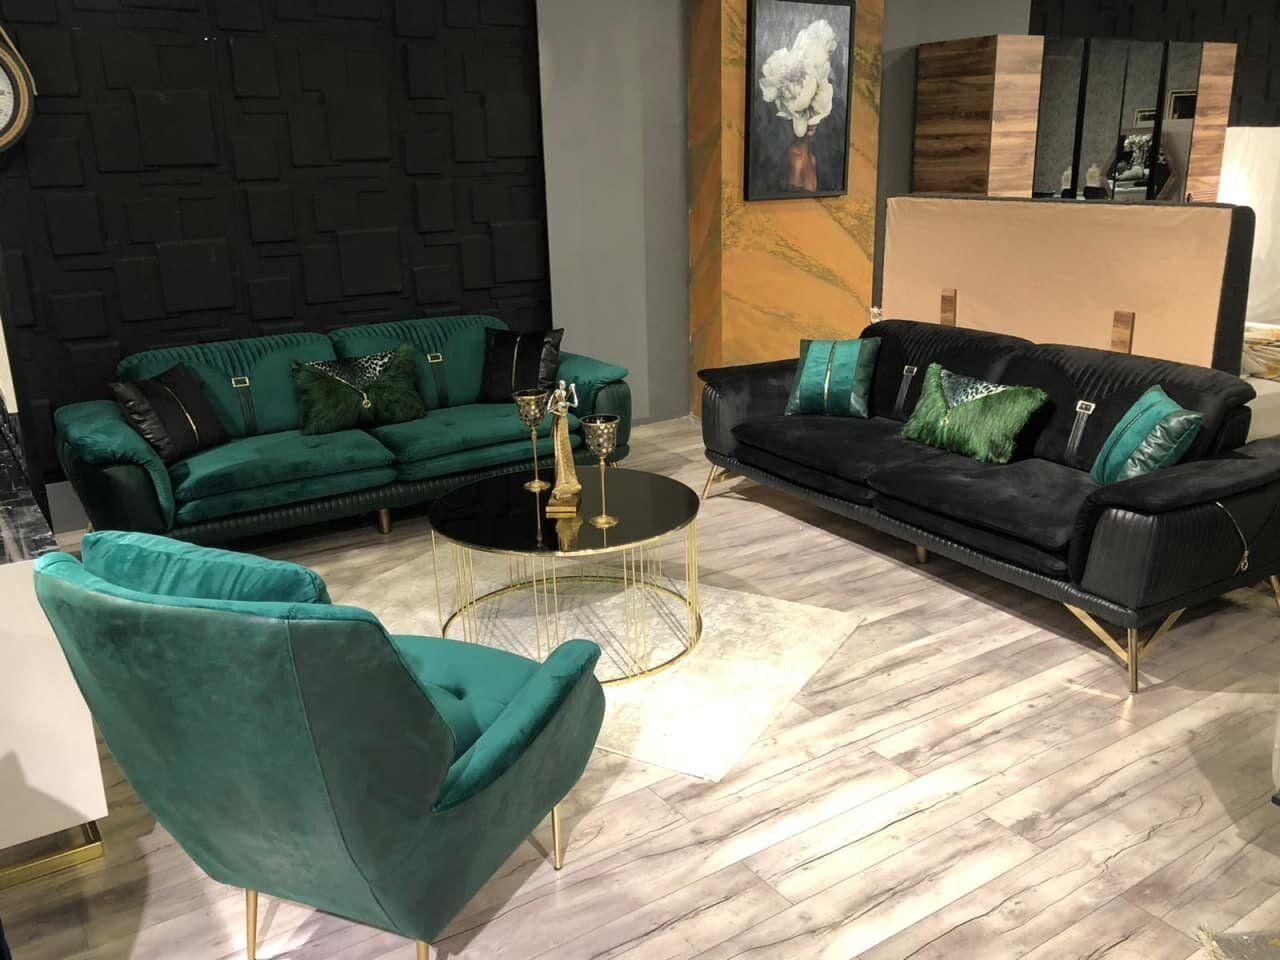 heev koltuk takimi tanriverdi mobilya 2 sofa design sofa styling furniture